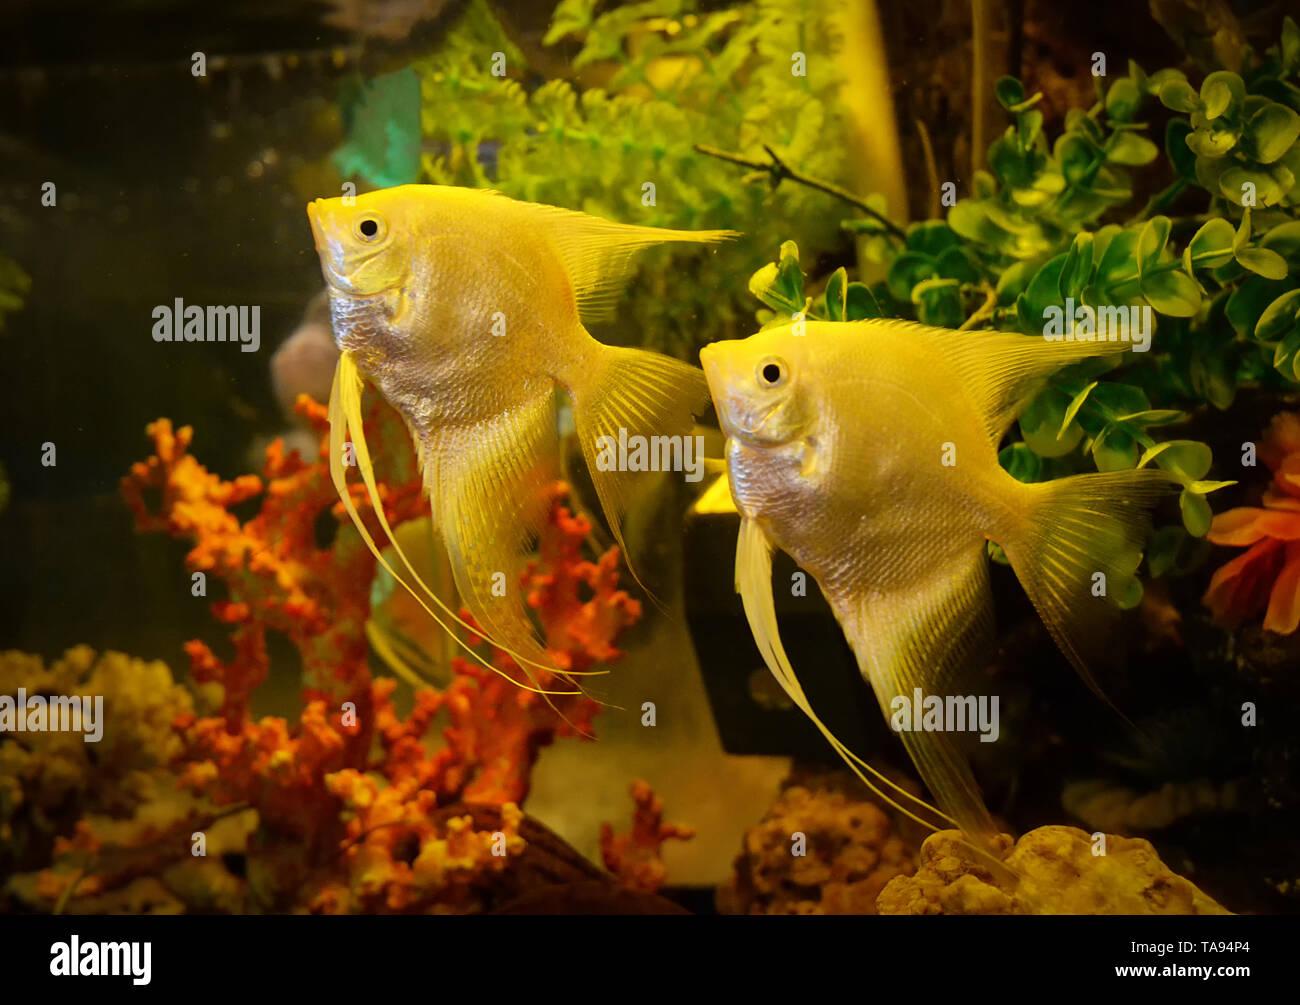 Silver Angelfish Swimming Fish Tank Underwater Aquarium Pterophyllum Scalare White Angel Fish Stock Photo Alamy